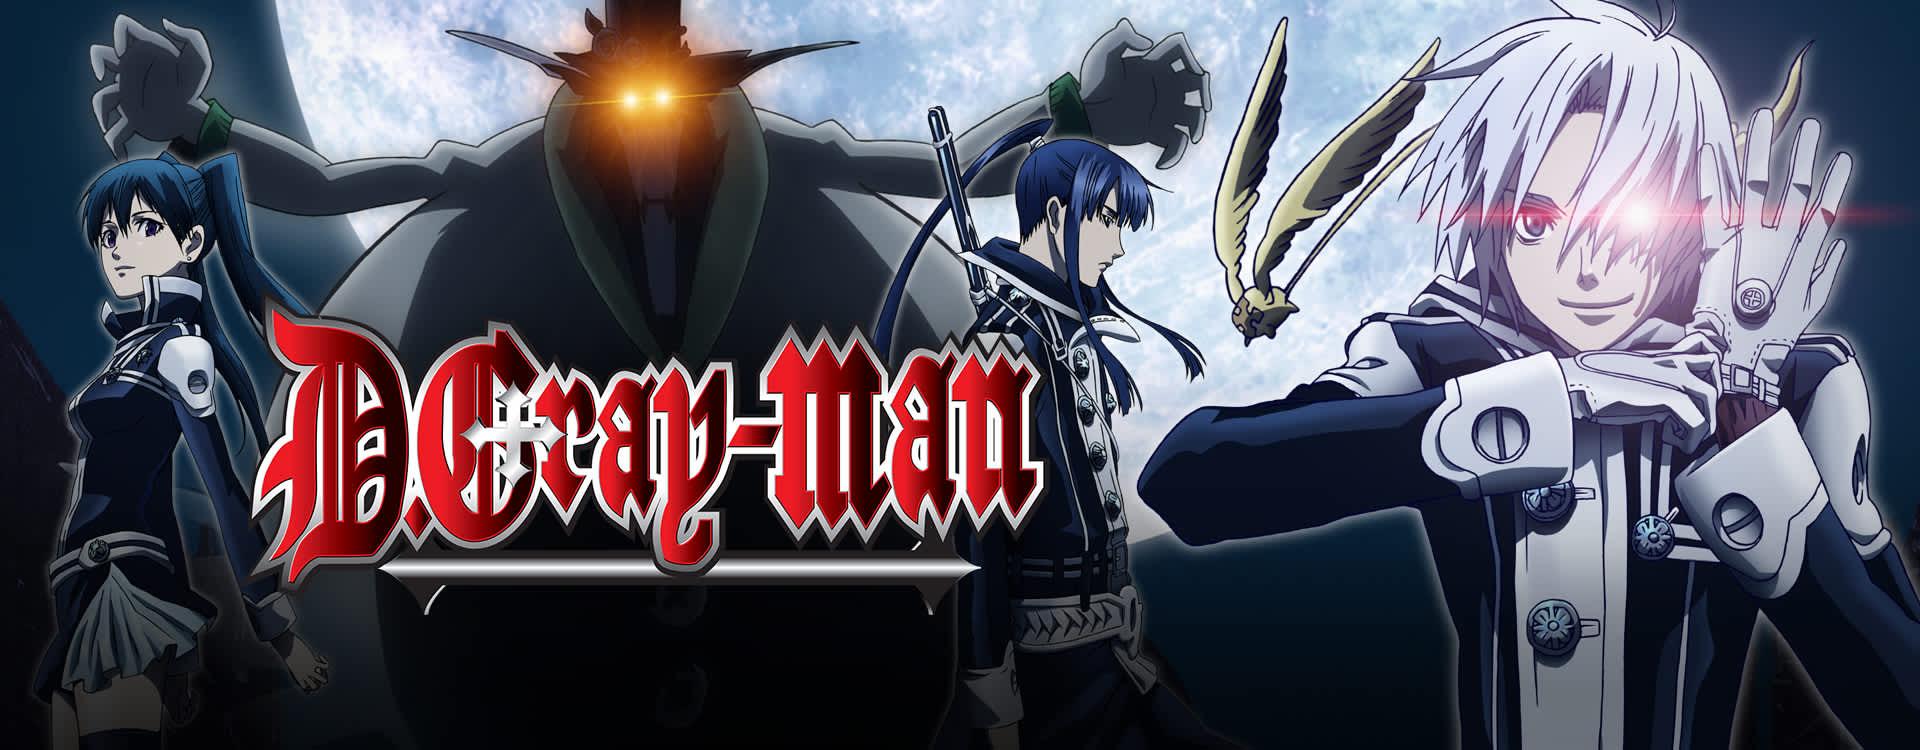 D Gray Man Stream Ger Sub